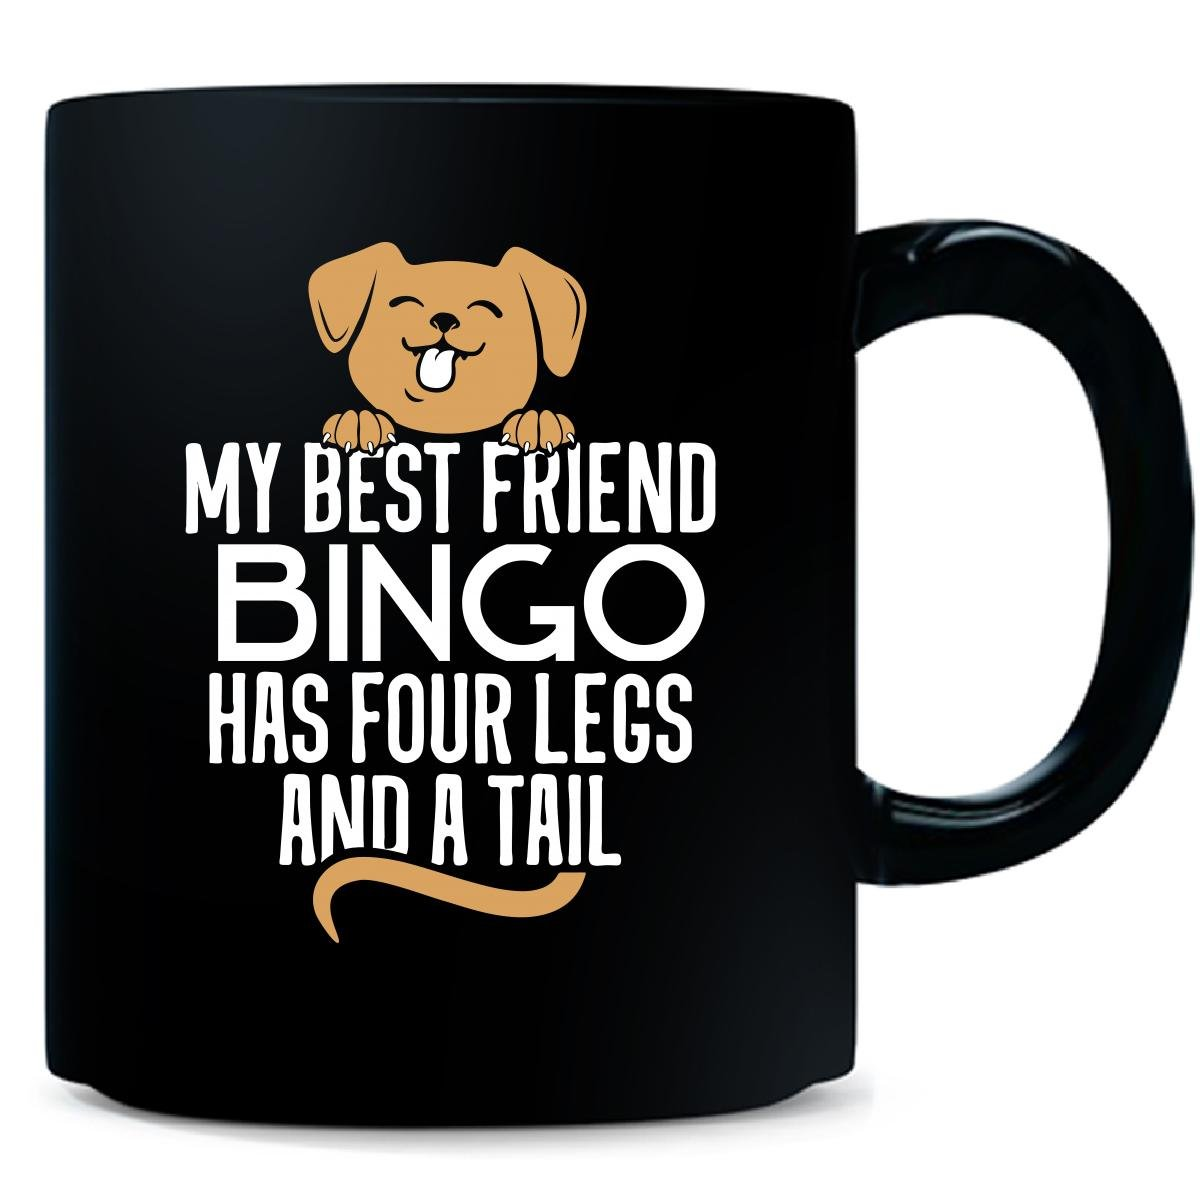 Dog Named Bingo Gift Four Legs And A Tail Custom - Mug